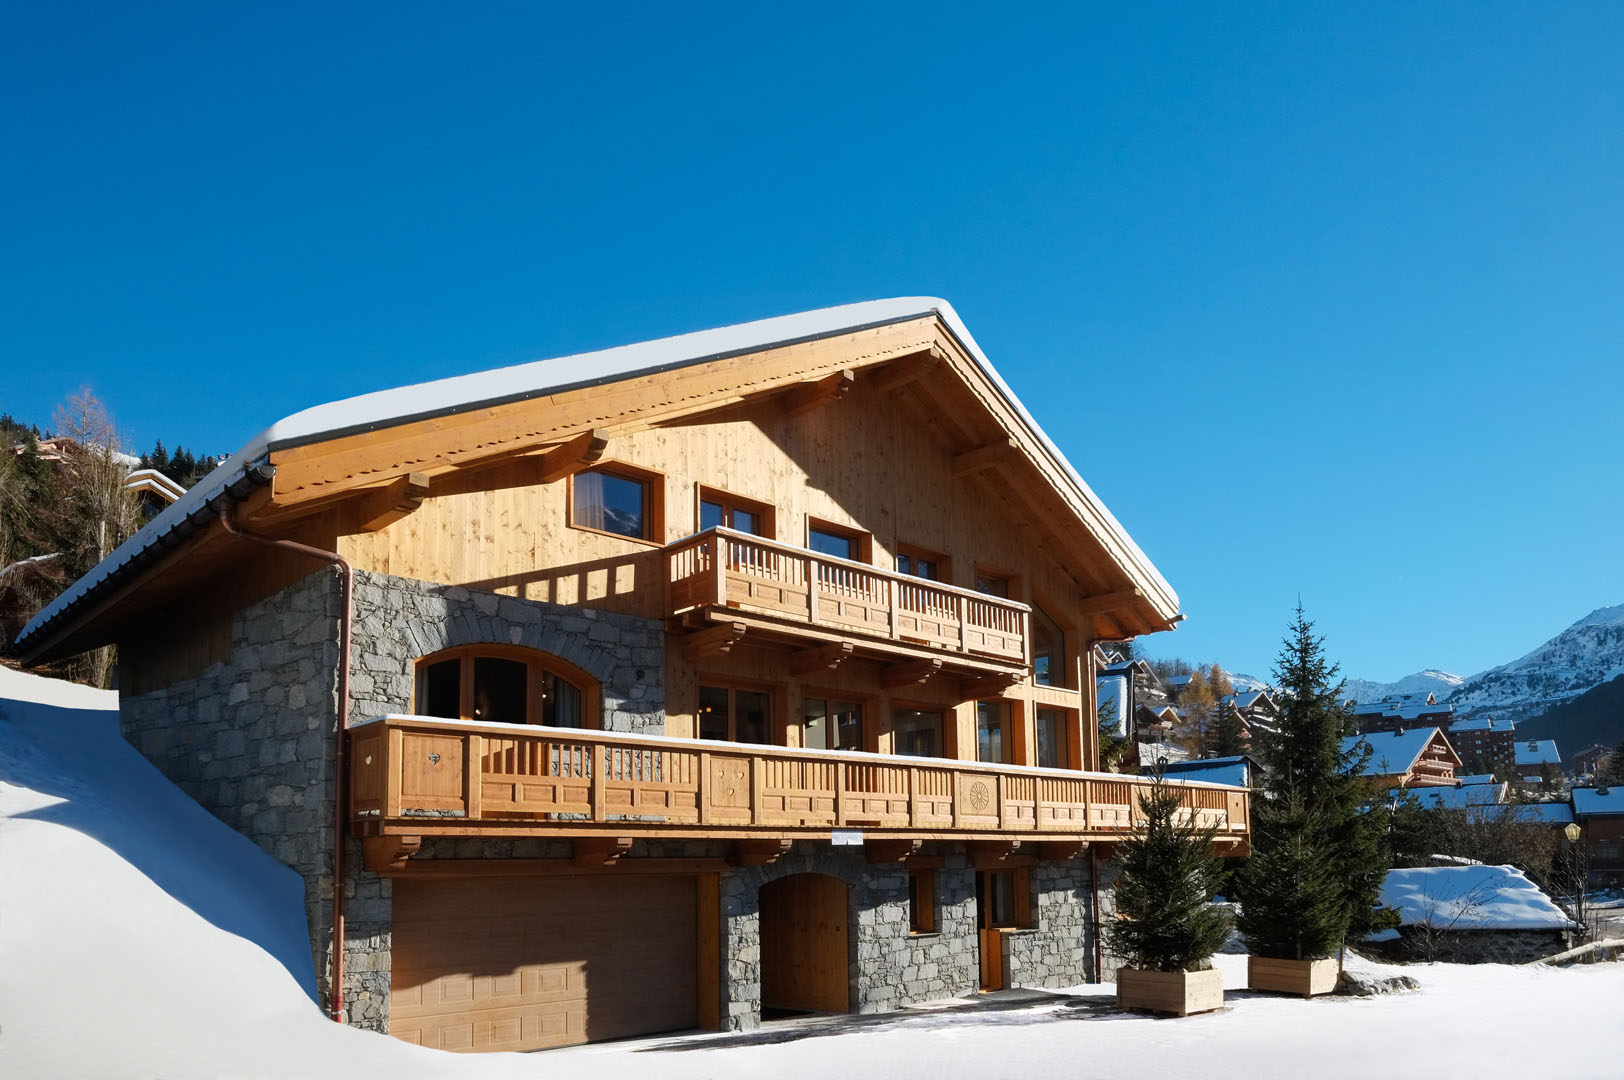 Bellacima Lodge